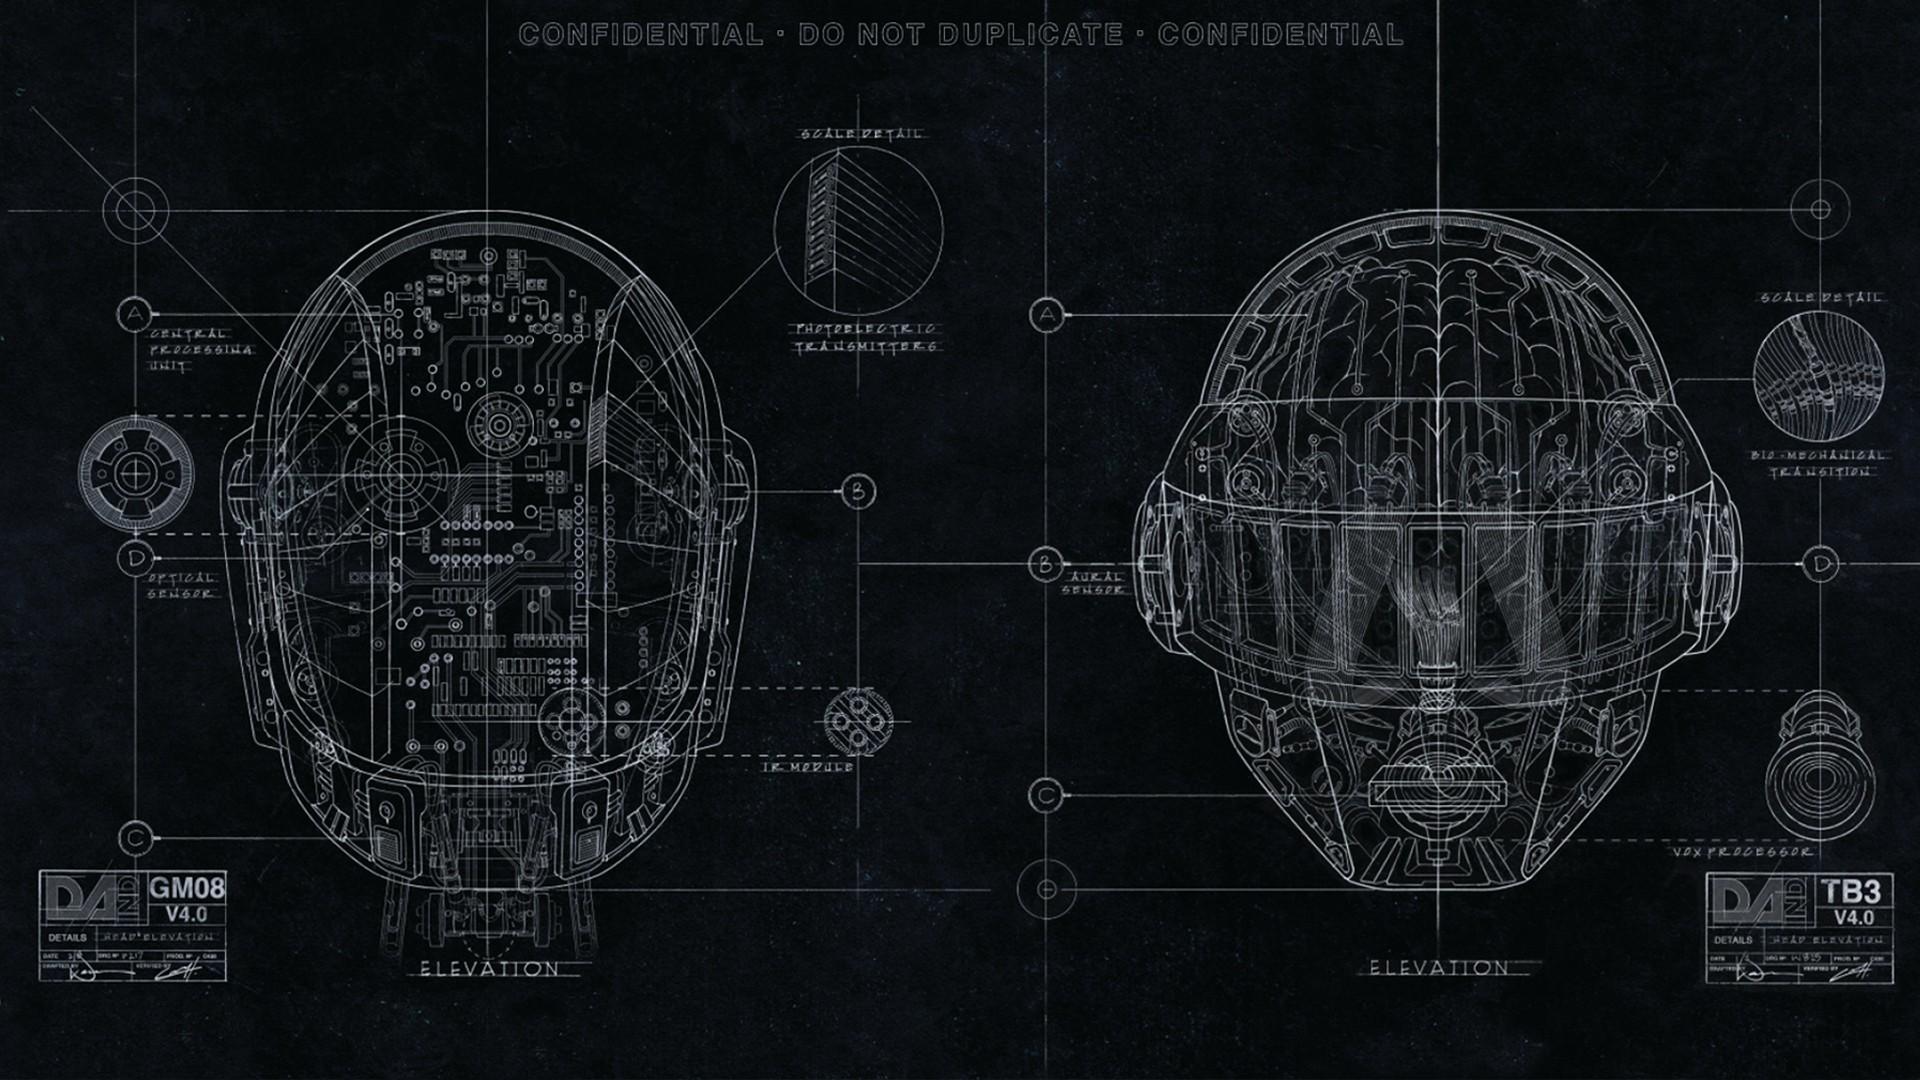 Daft Punk Backgrounds (69+ images)